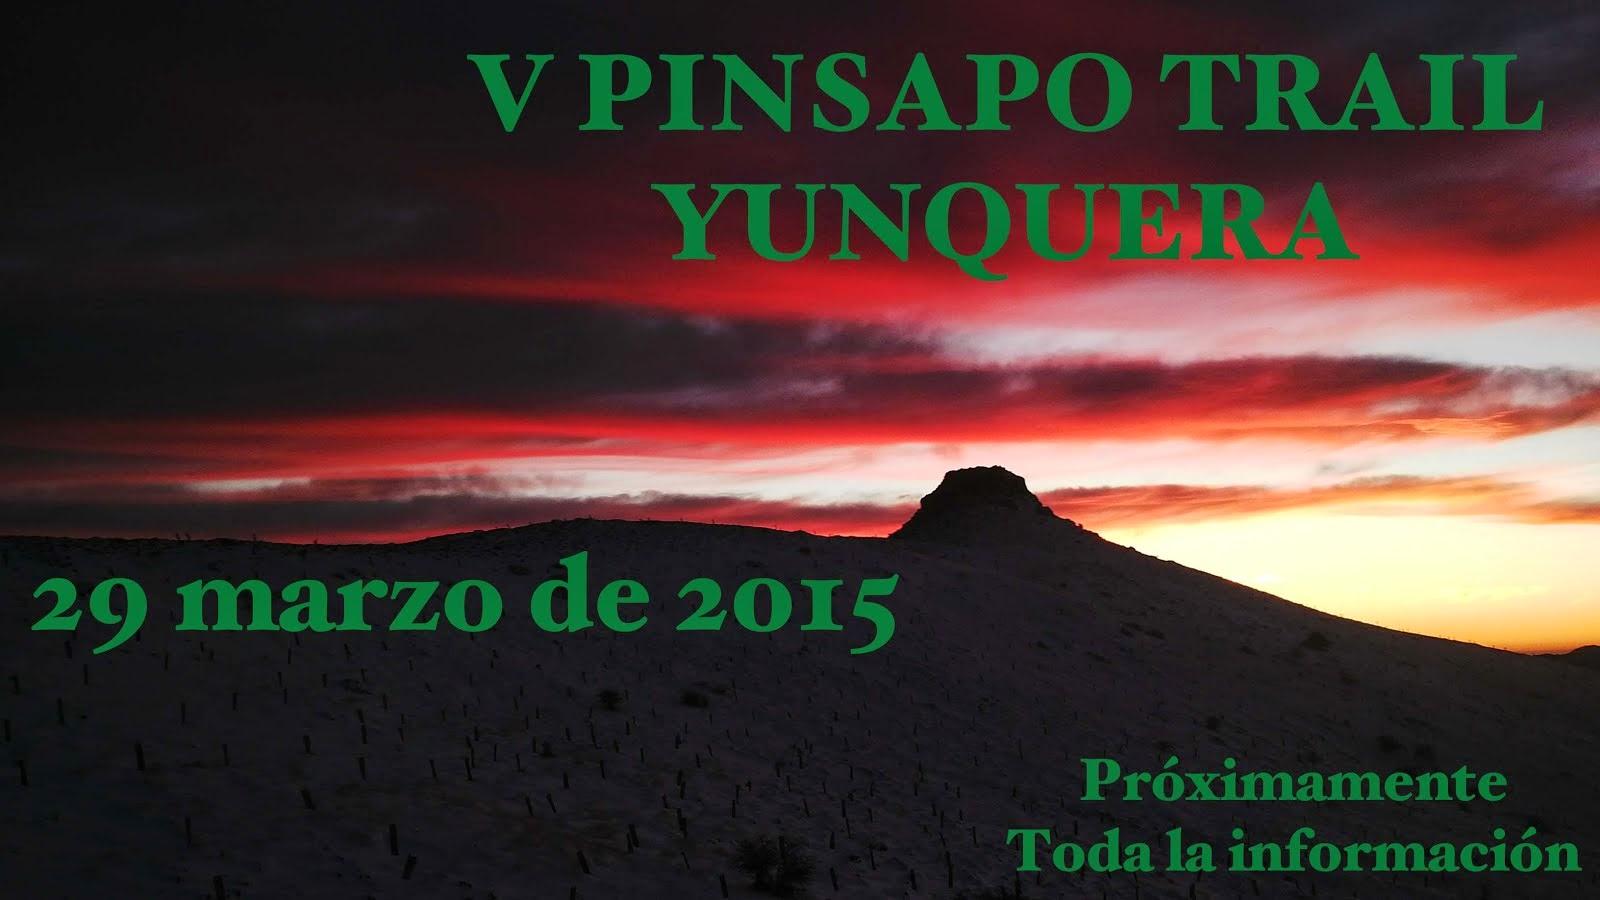 CXM PINSAPO TRAIL 2015